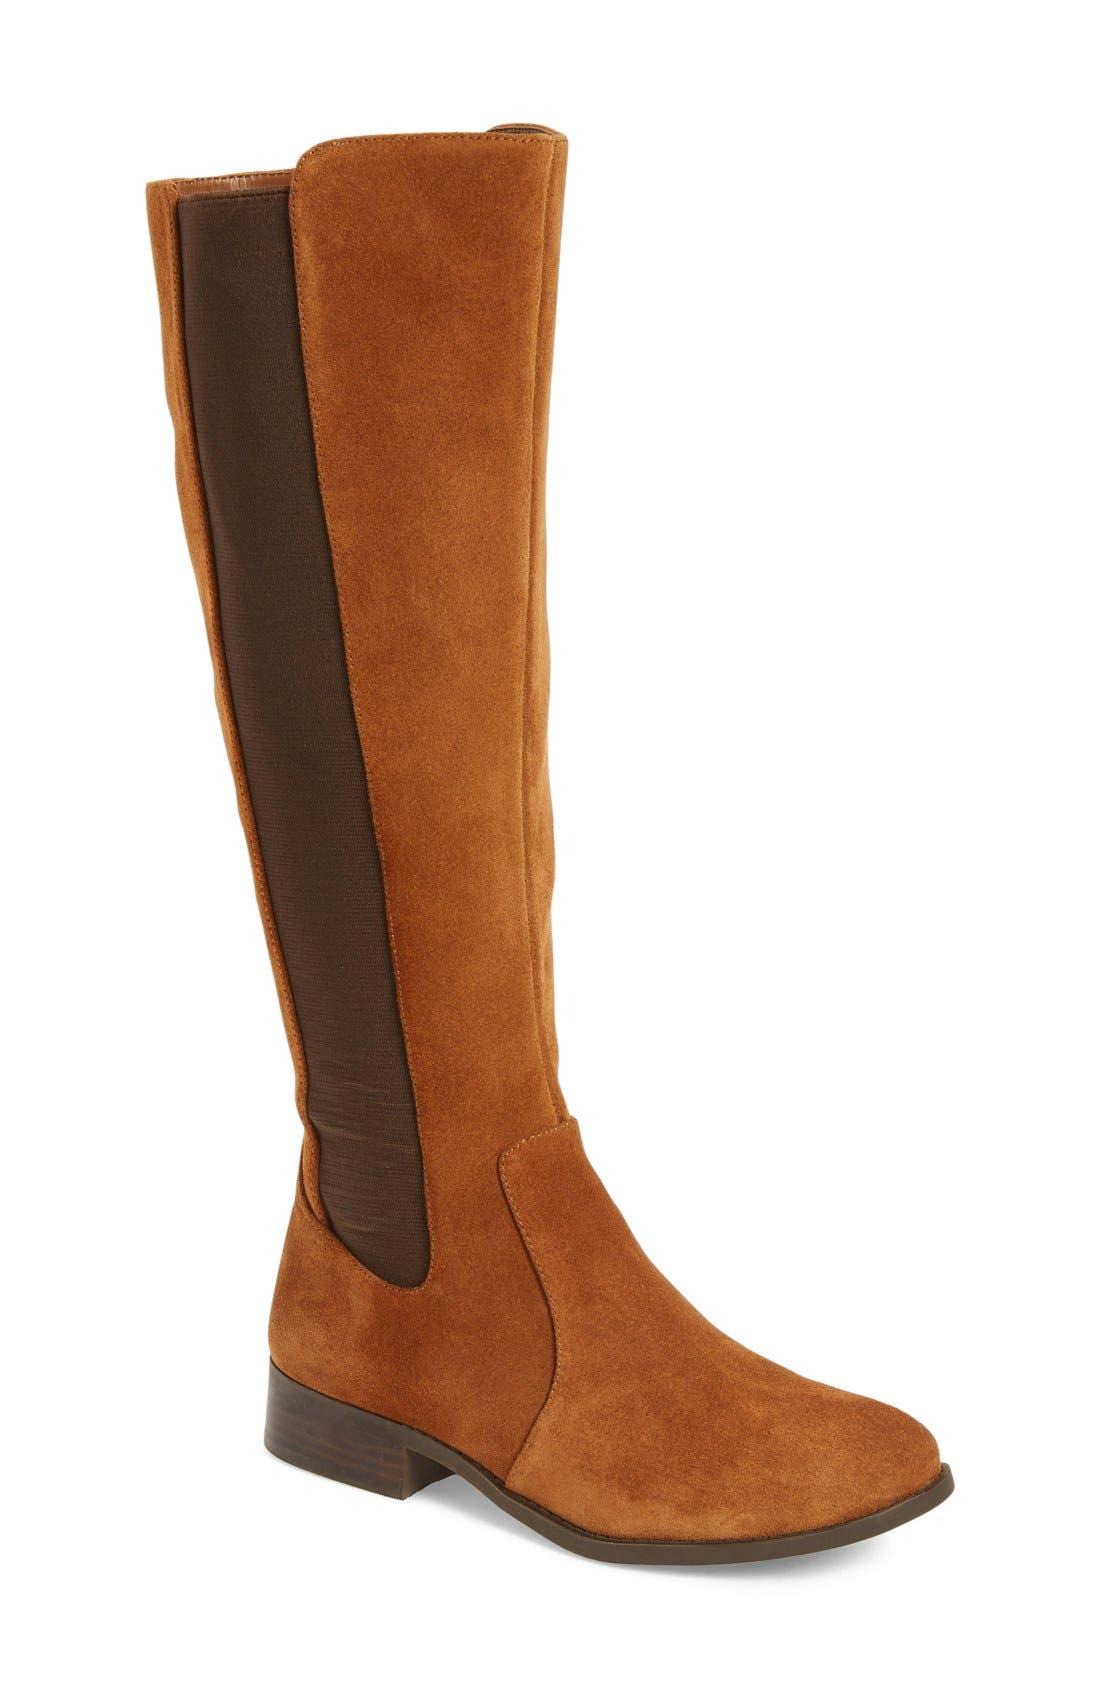 Alternate Image 1 Selected - Jessica Simpson 'Ricel' Riding Boot (Women) (Regular & Wide Calf)